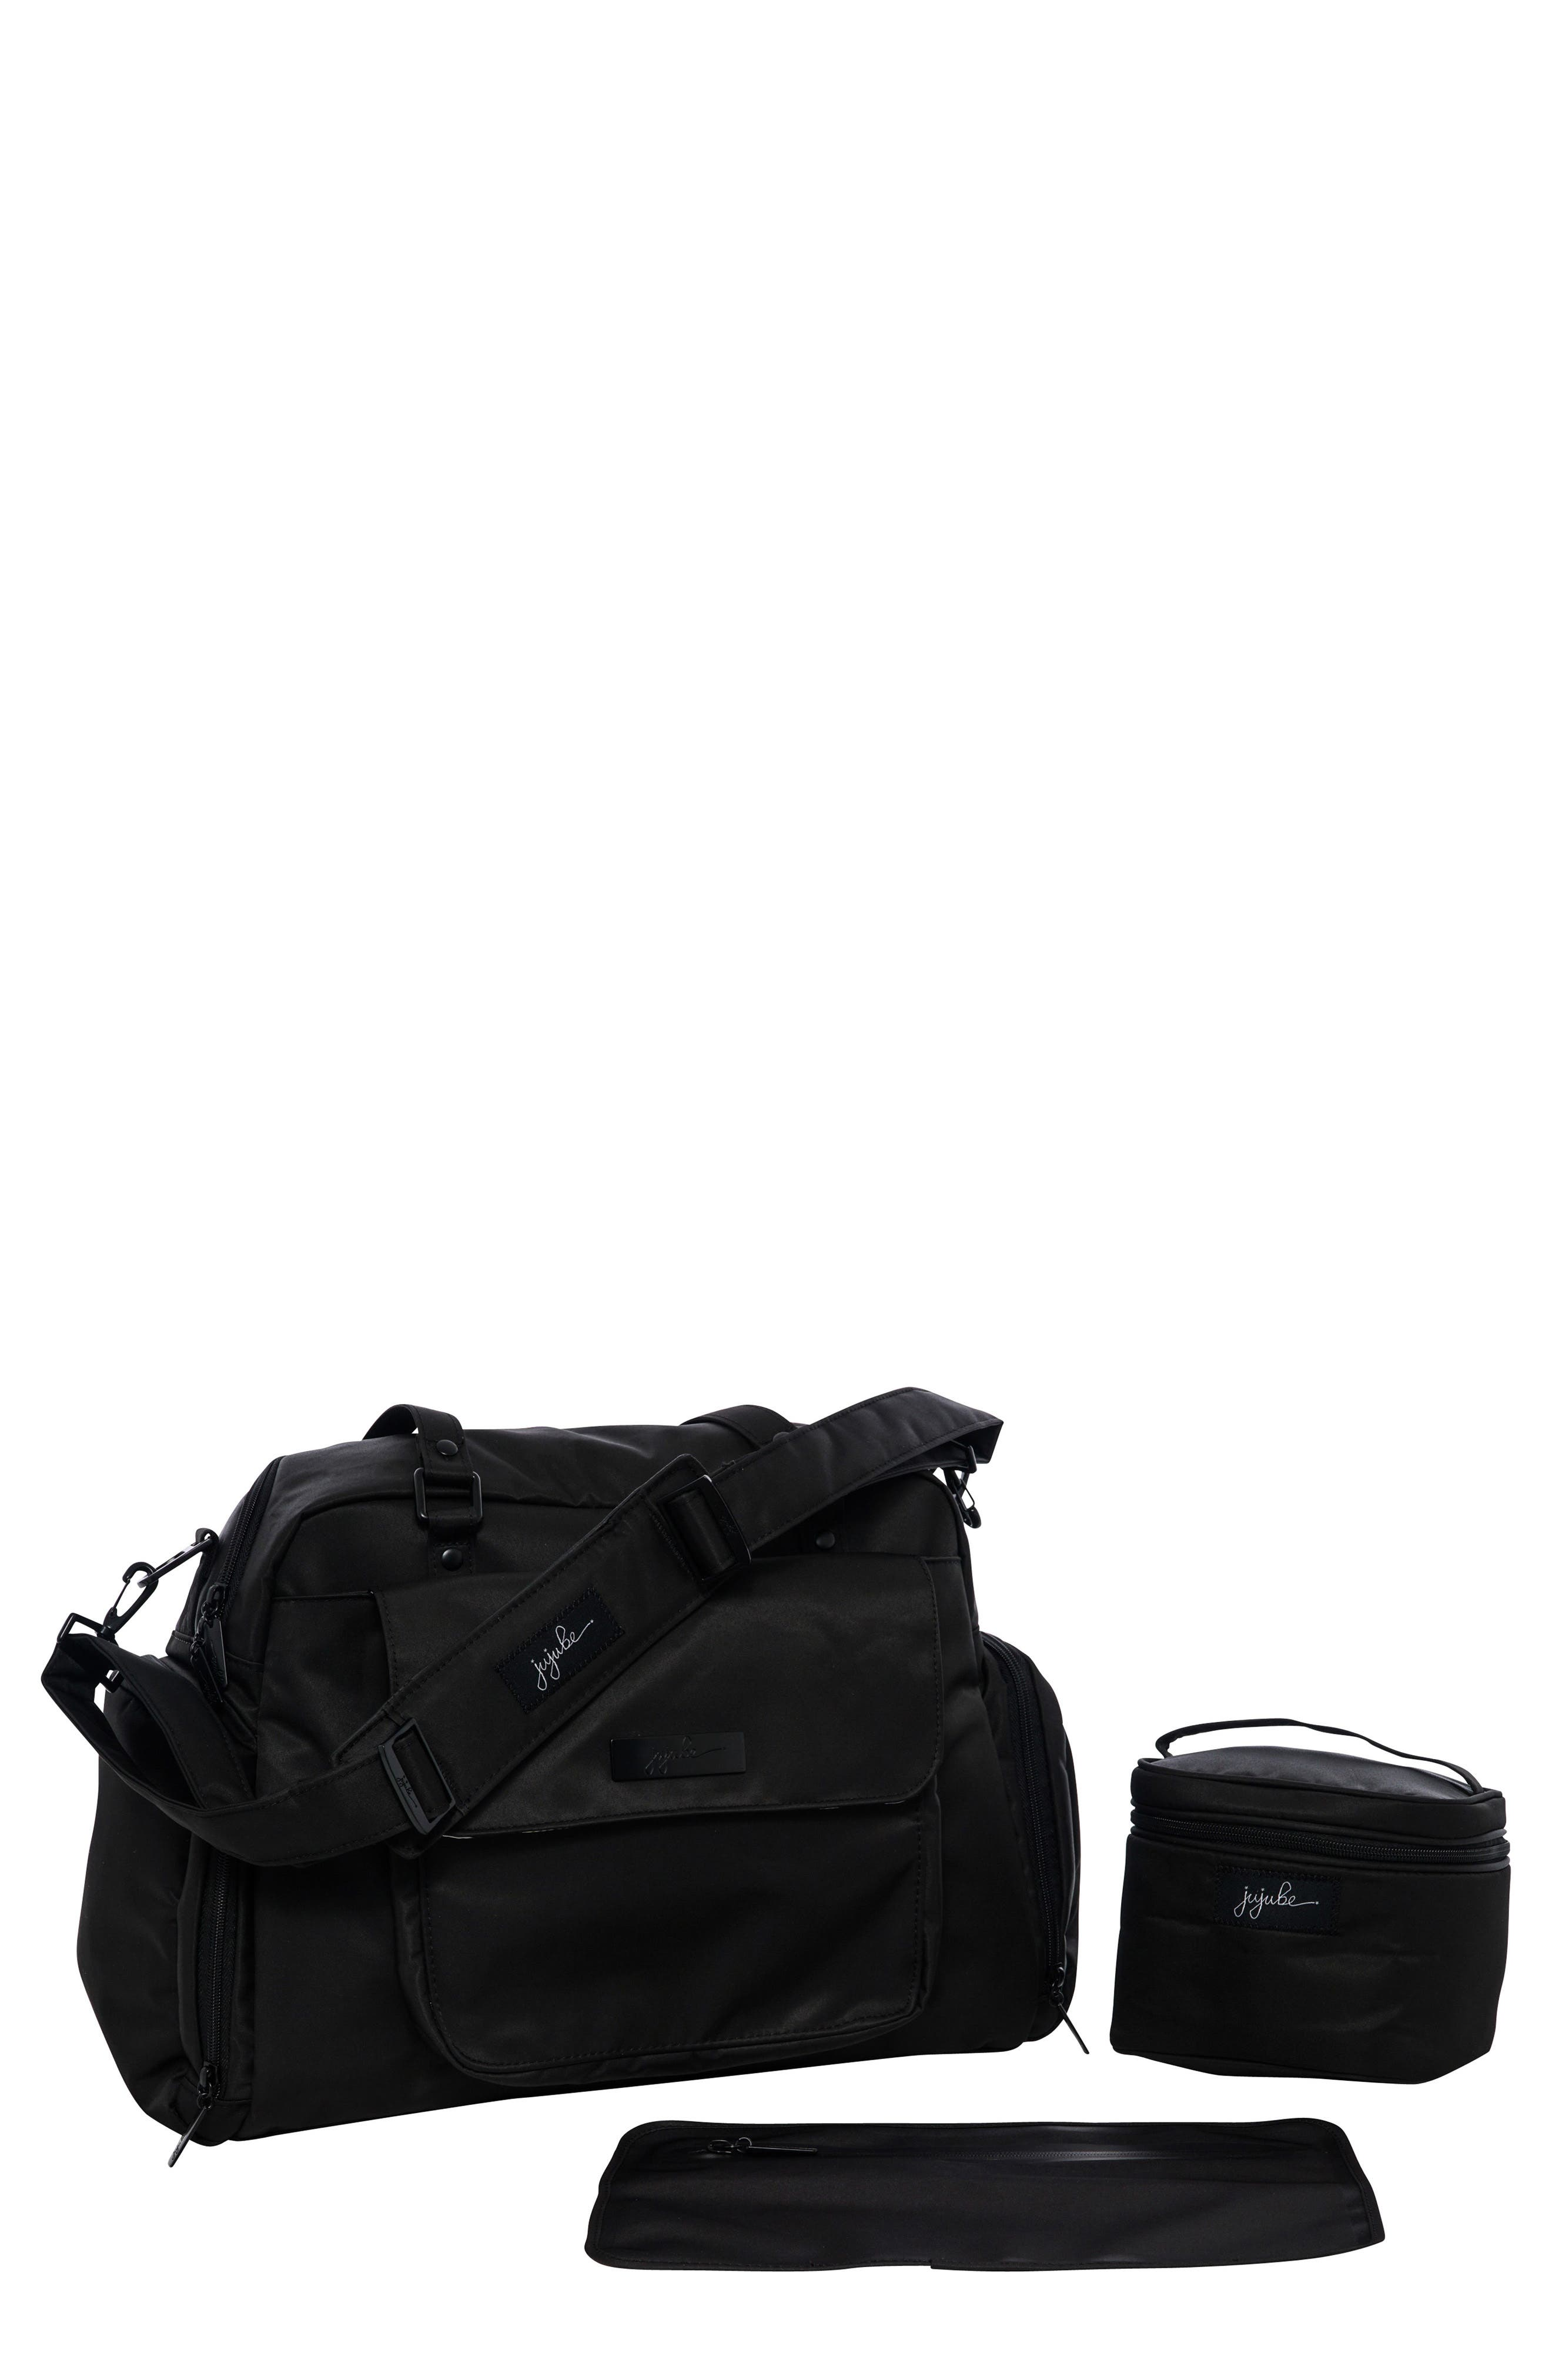 Onyx Be Pumped Bag,                         Main,                         color, 001